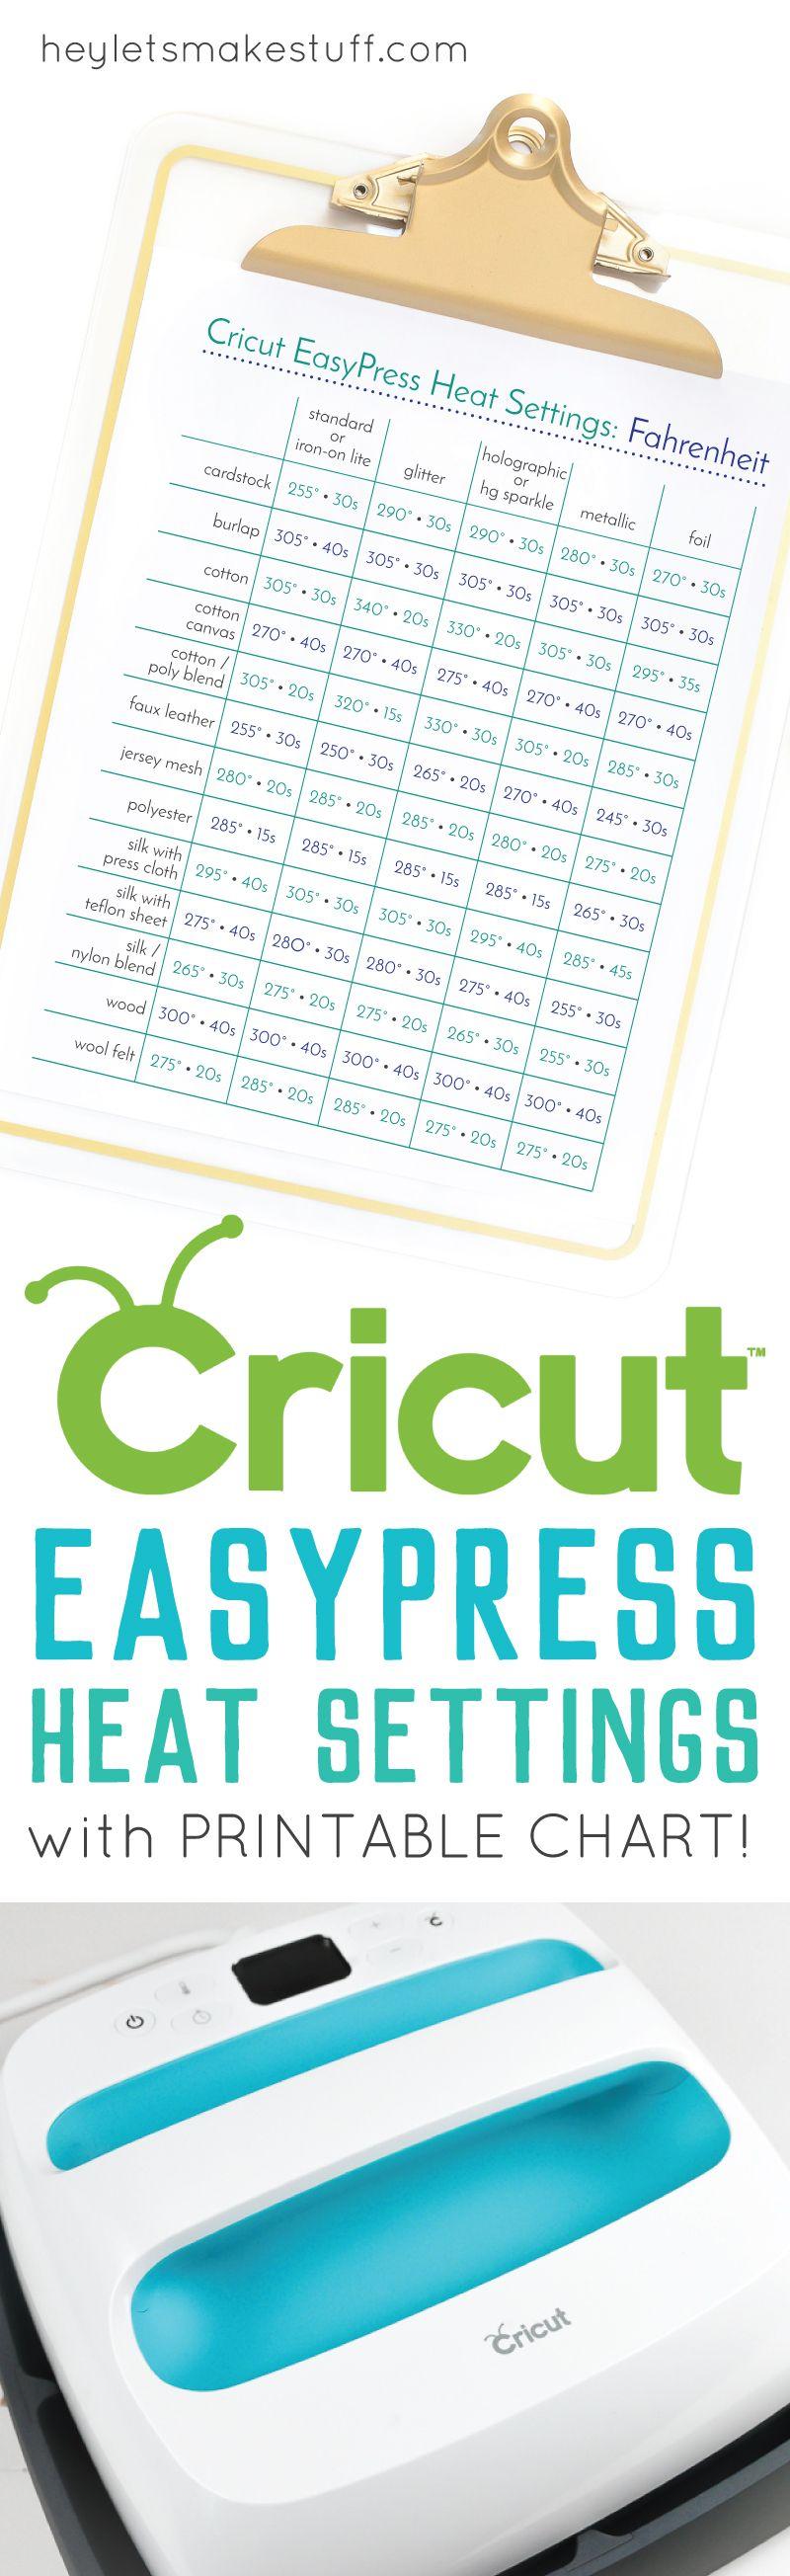 Heat Settings for the Cricut Easy Press Cricut tutorials